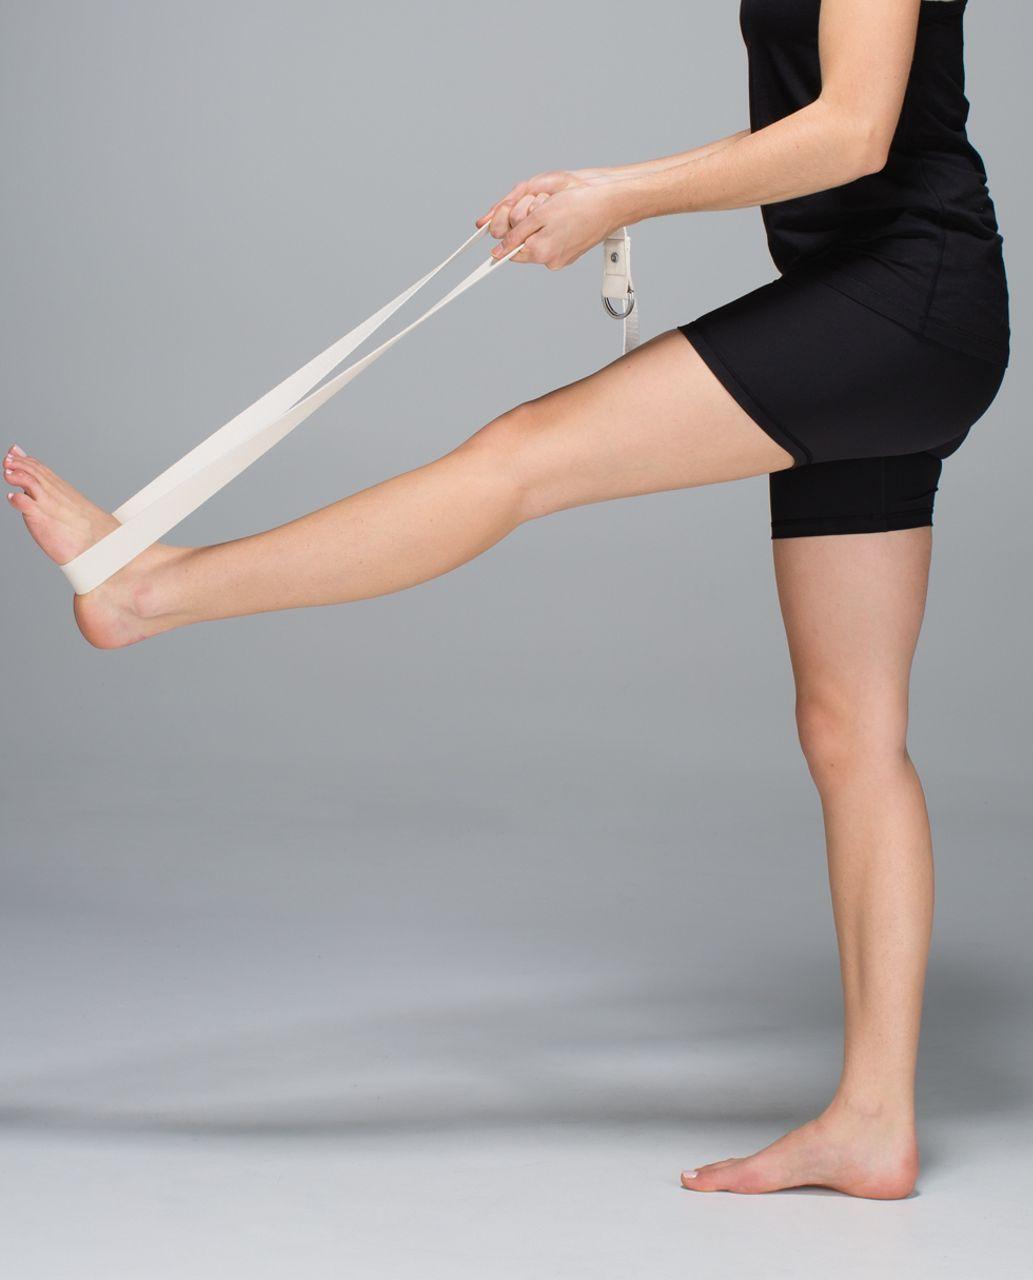 Lululemon No Limits Stretching Strap - Sand Stone